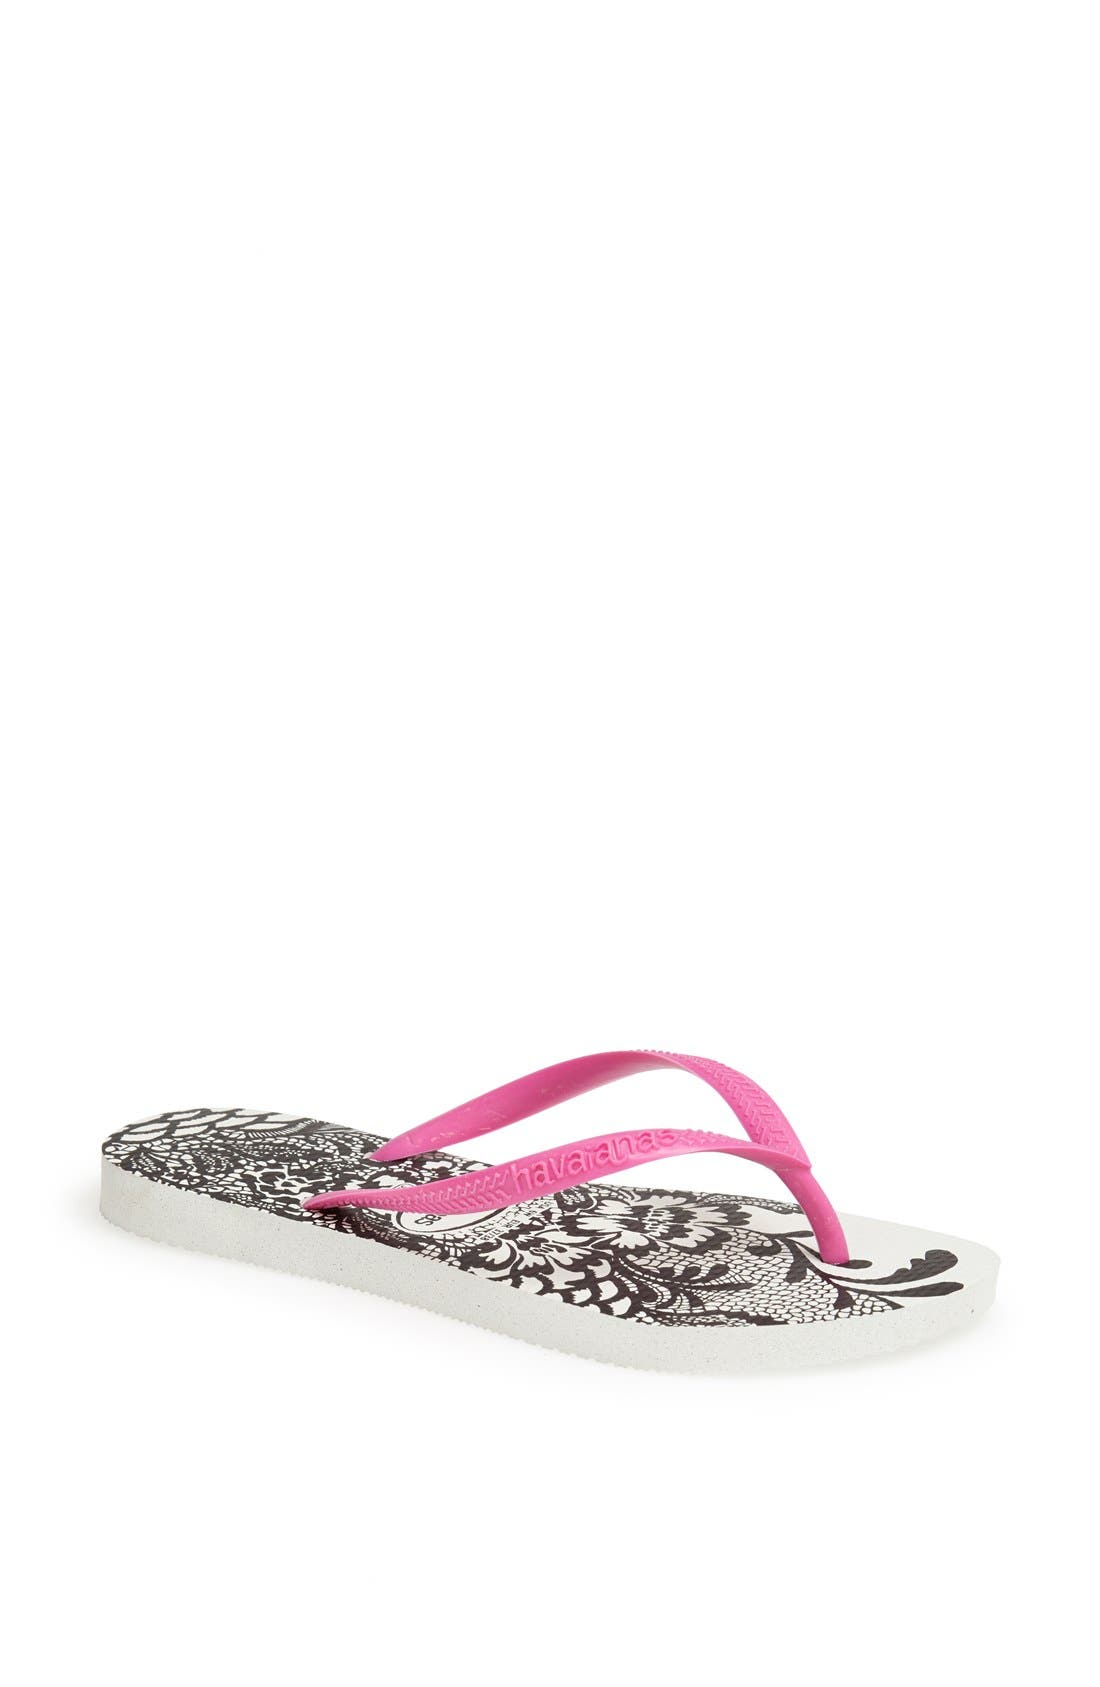 Alternate Image 1 Selected - Havaianas 'Slim Lace' Flip Flop (Women)